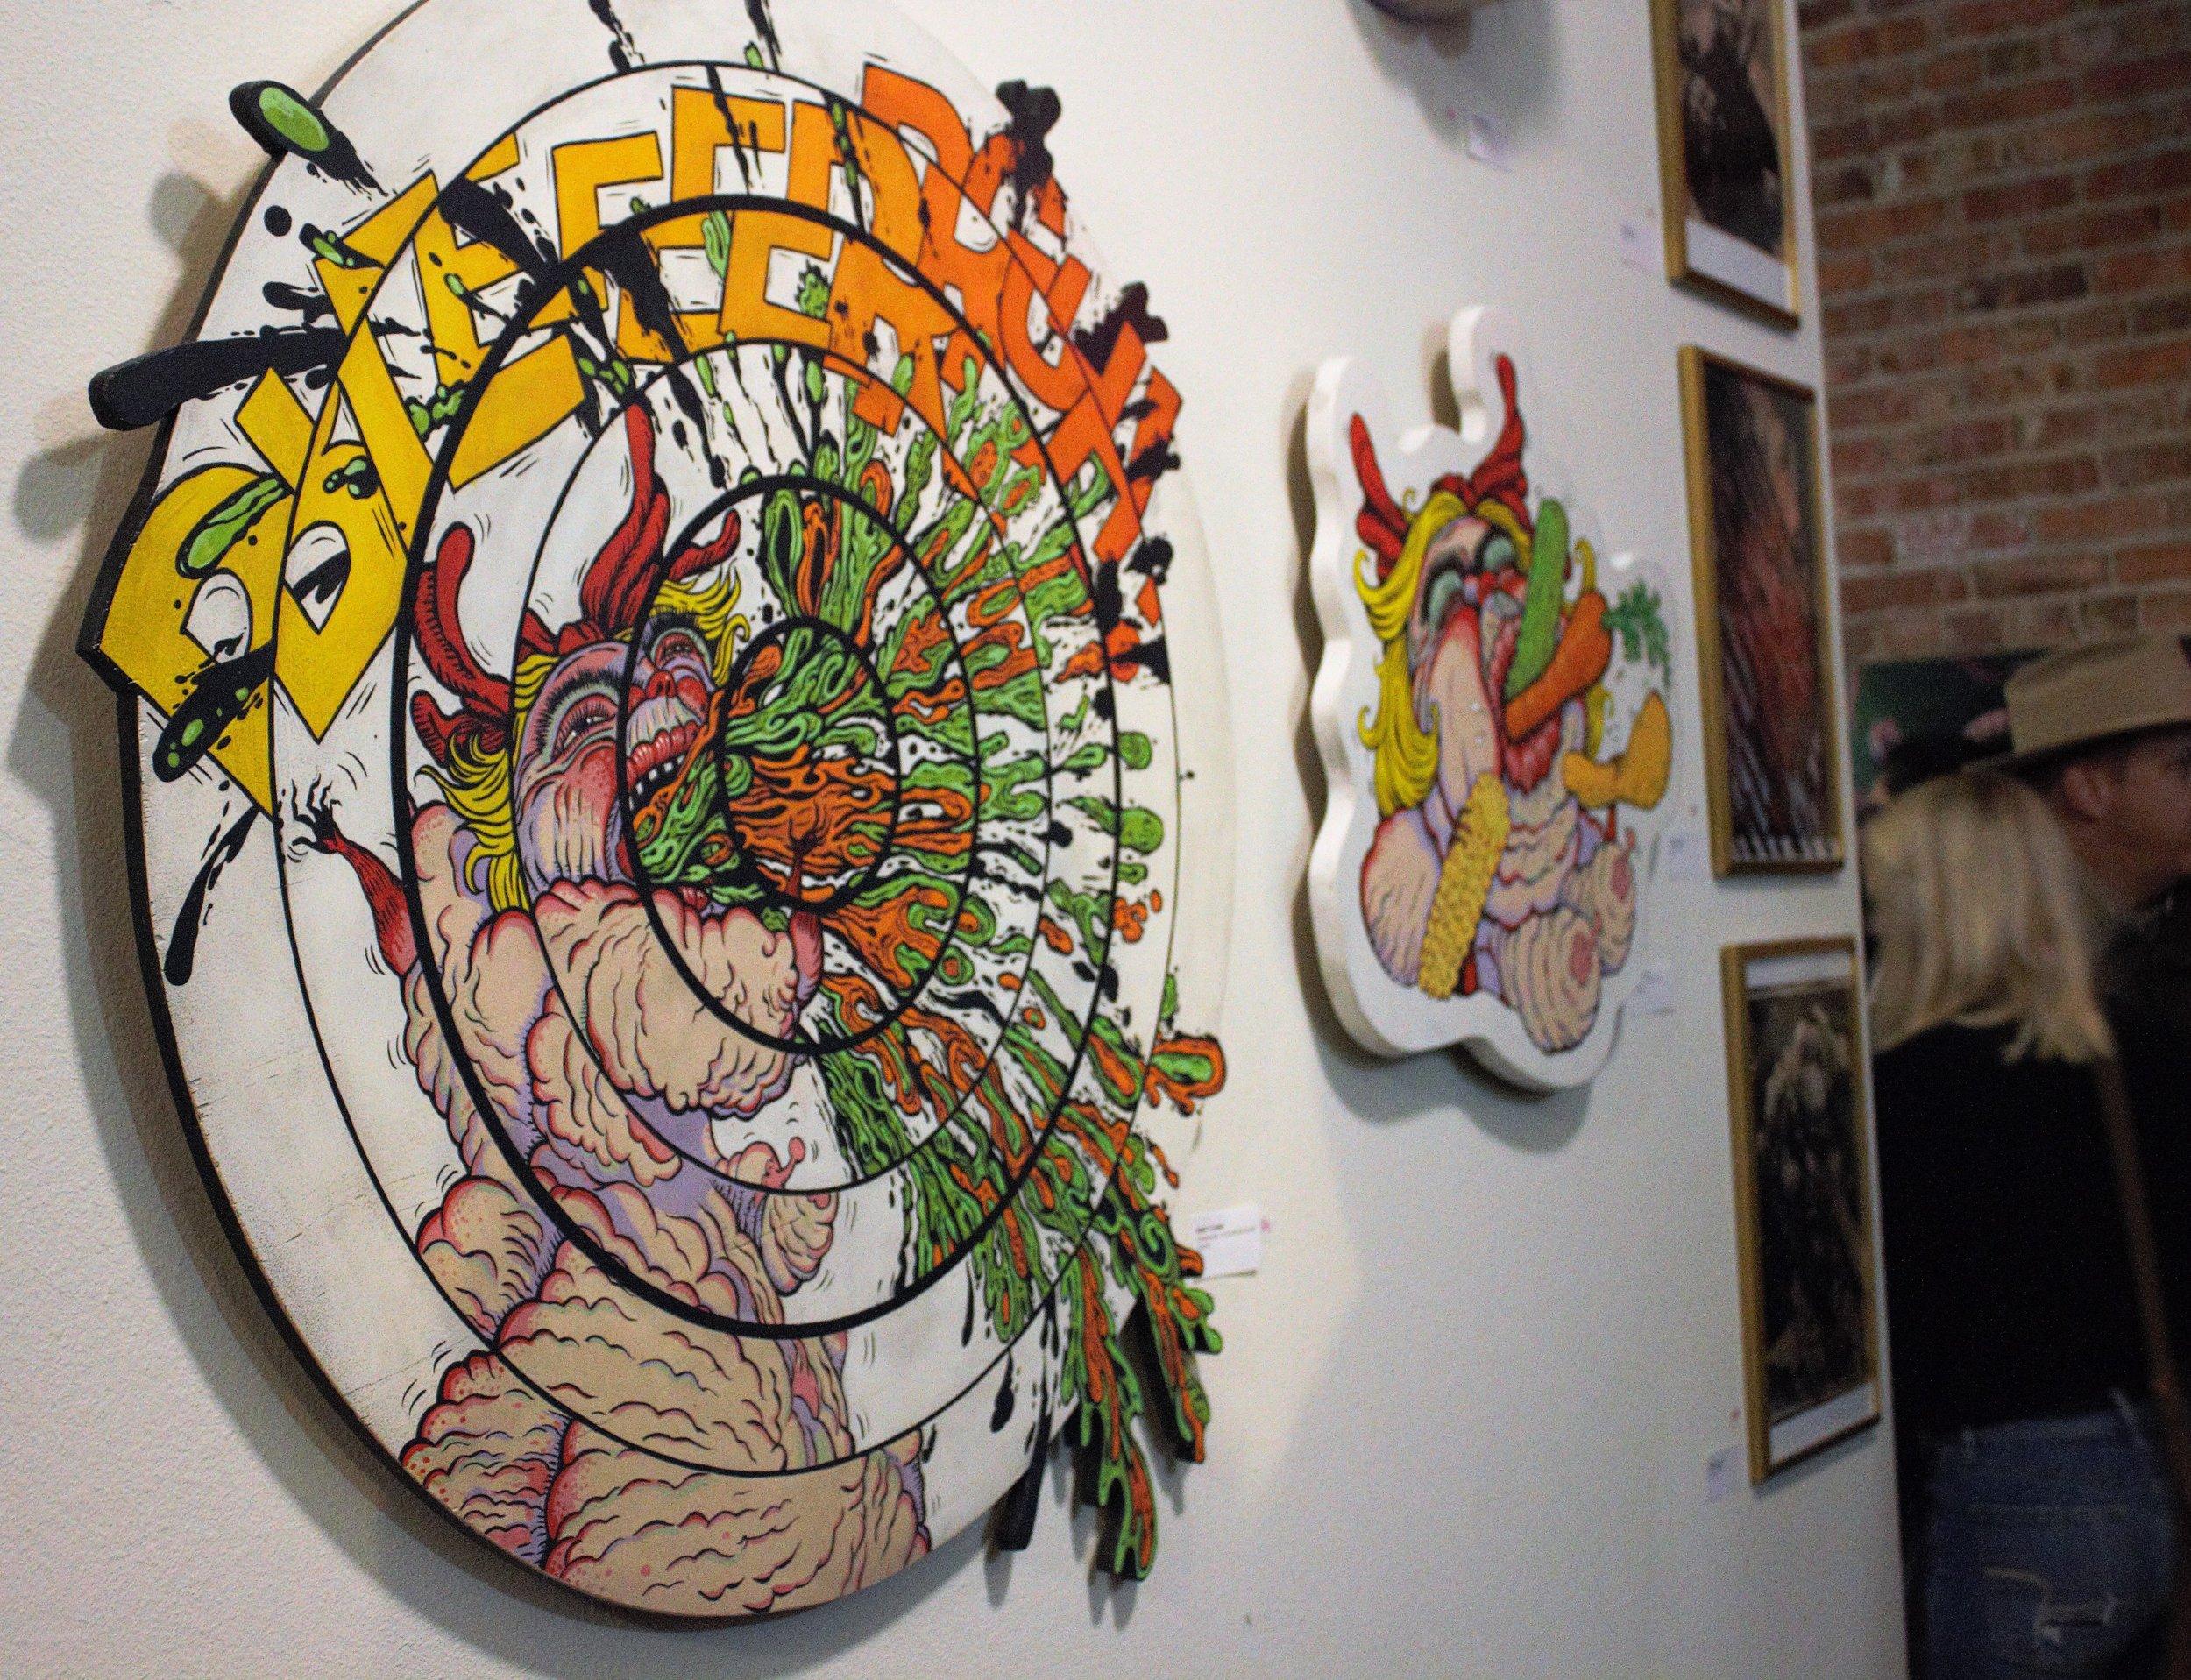 Art by Brian K. Jones and Brian K. Scott